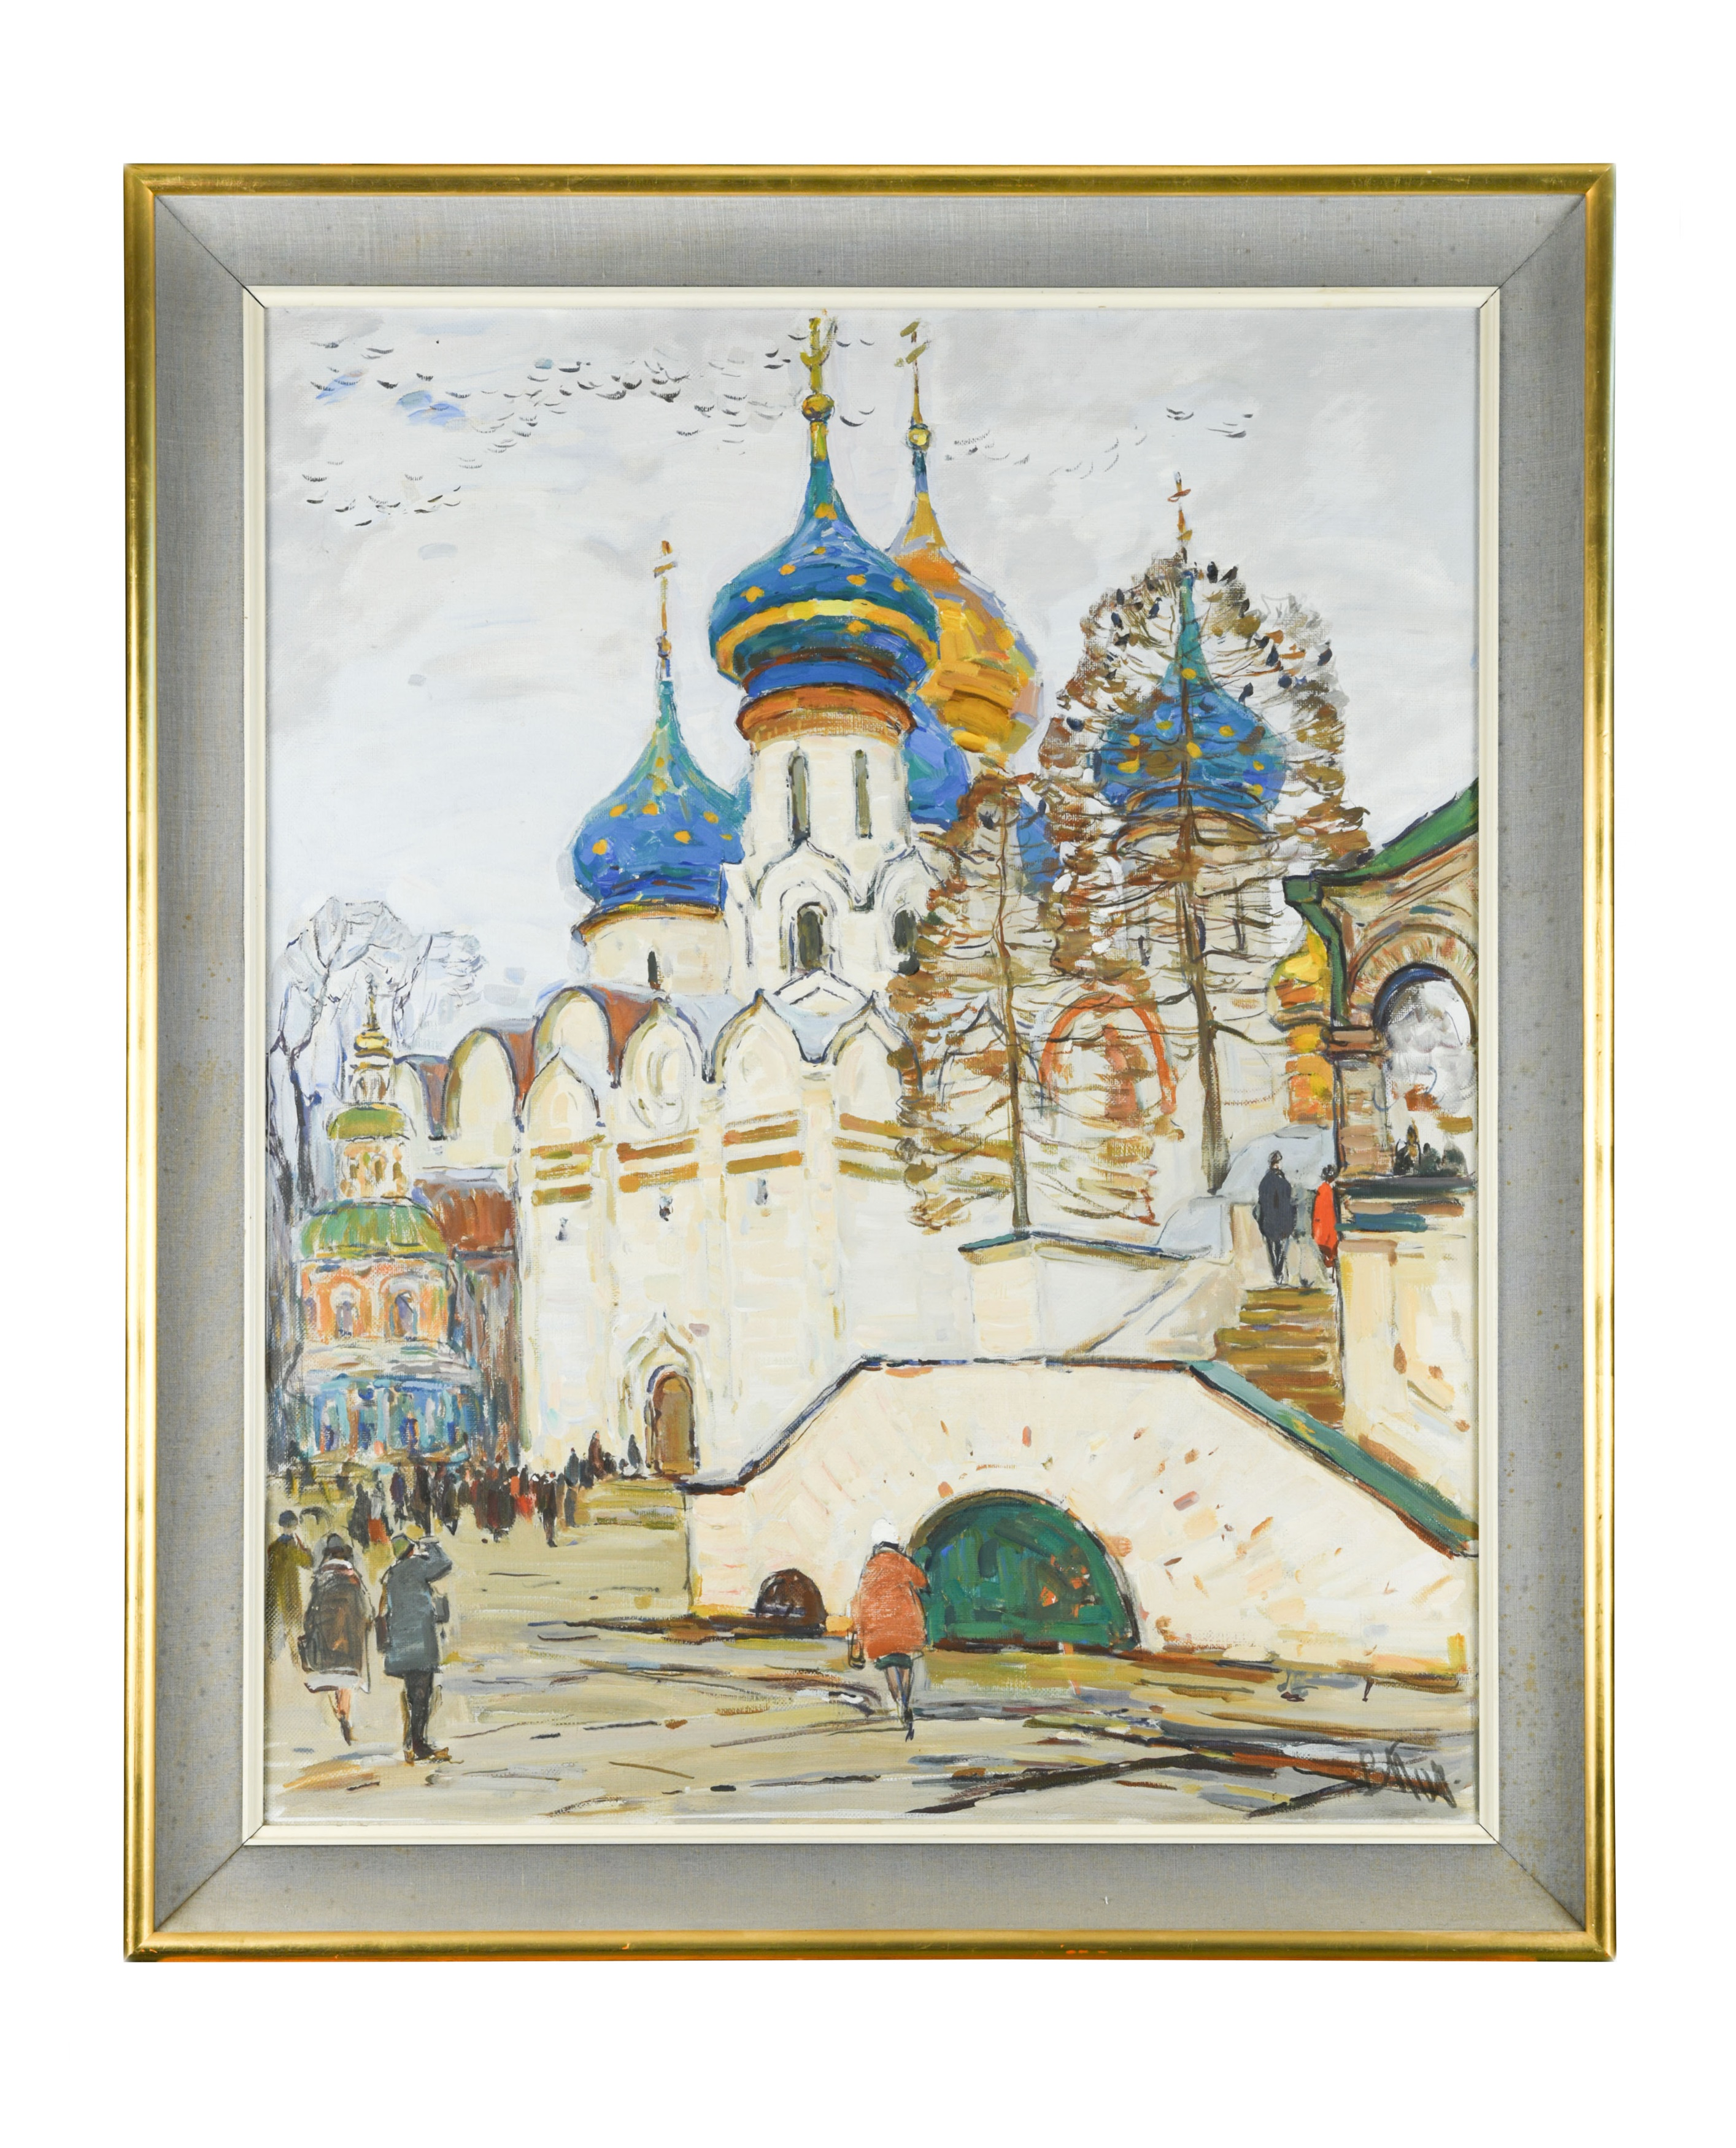 Vassili Paramonov (Russian 1923-2006)